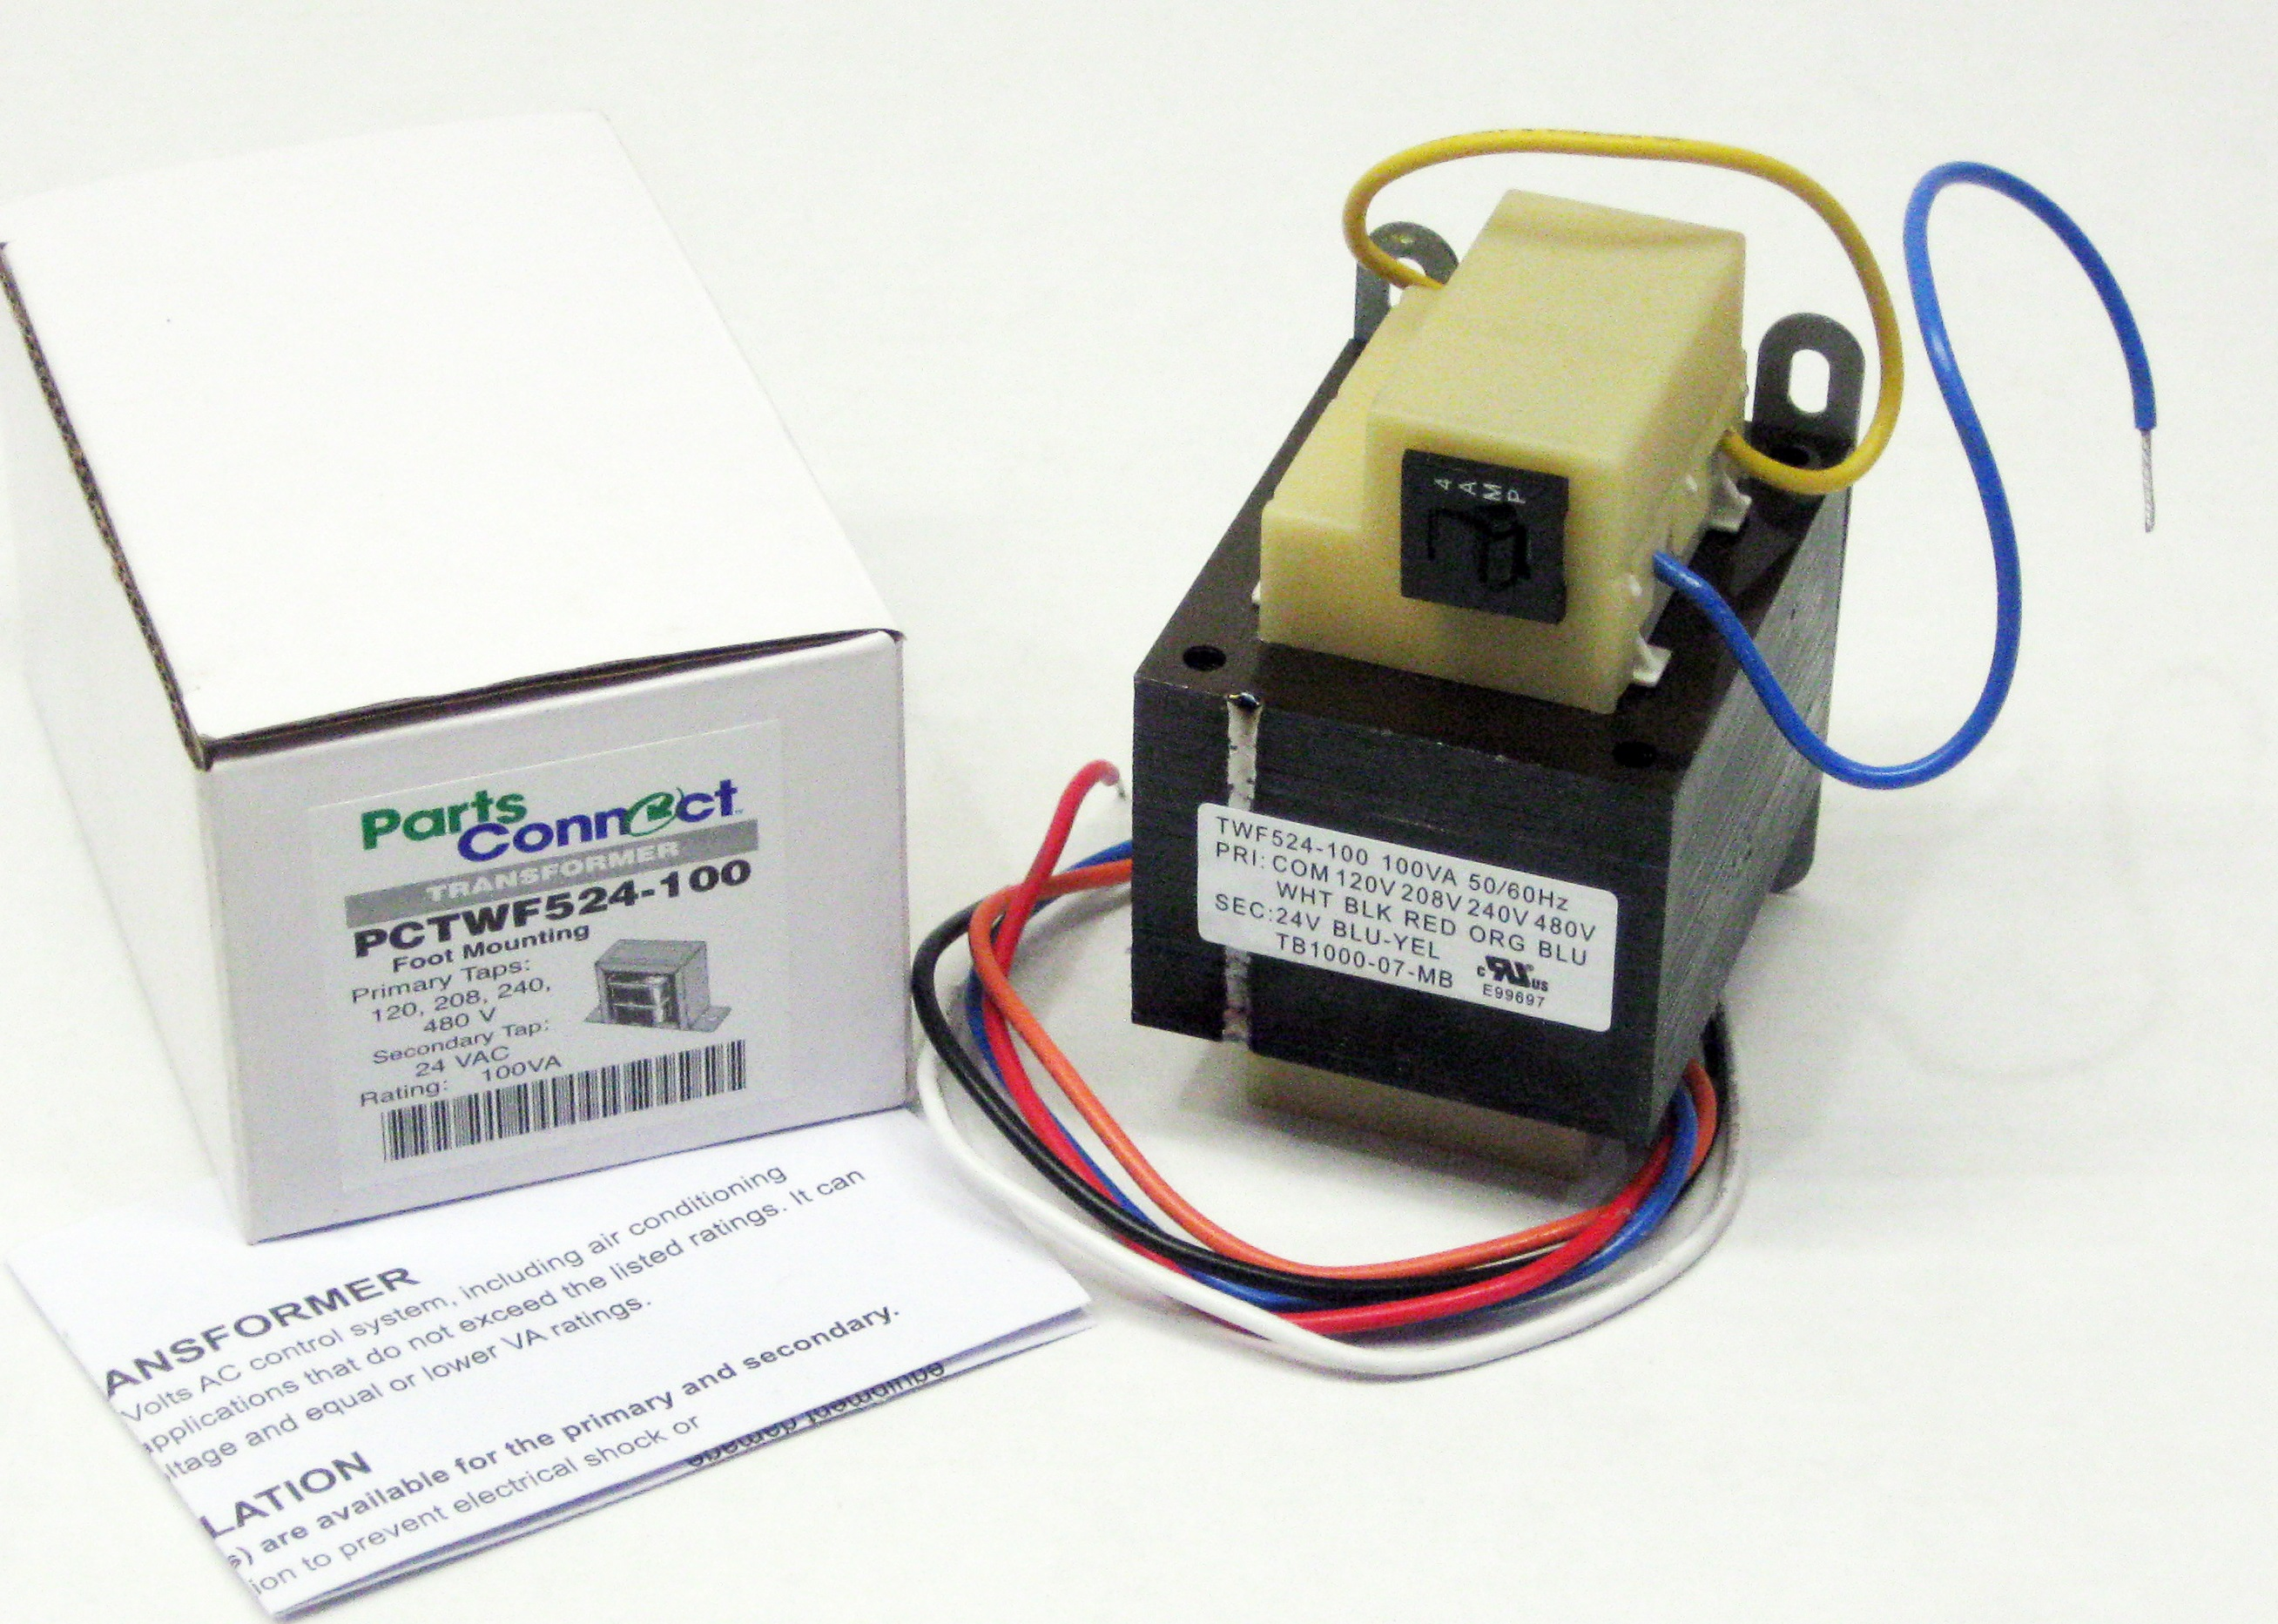 100va Transformer Primary 120v 208v 240v 480v Volt 24v Secondary To Wiring Diagram Hvac Furnace Multi Tap